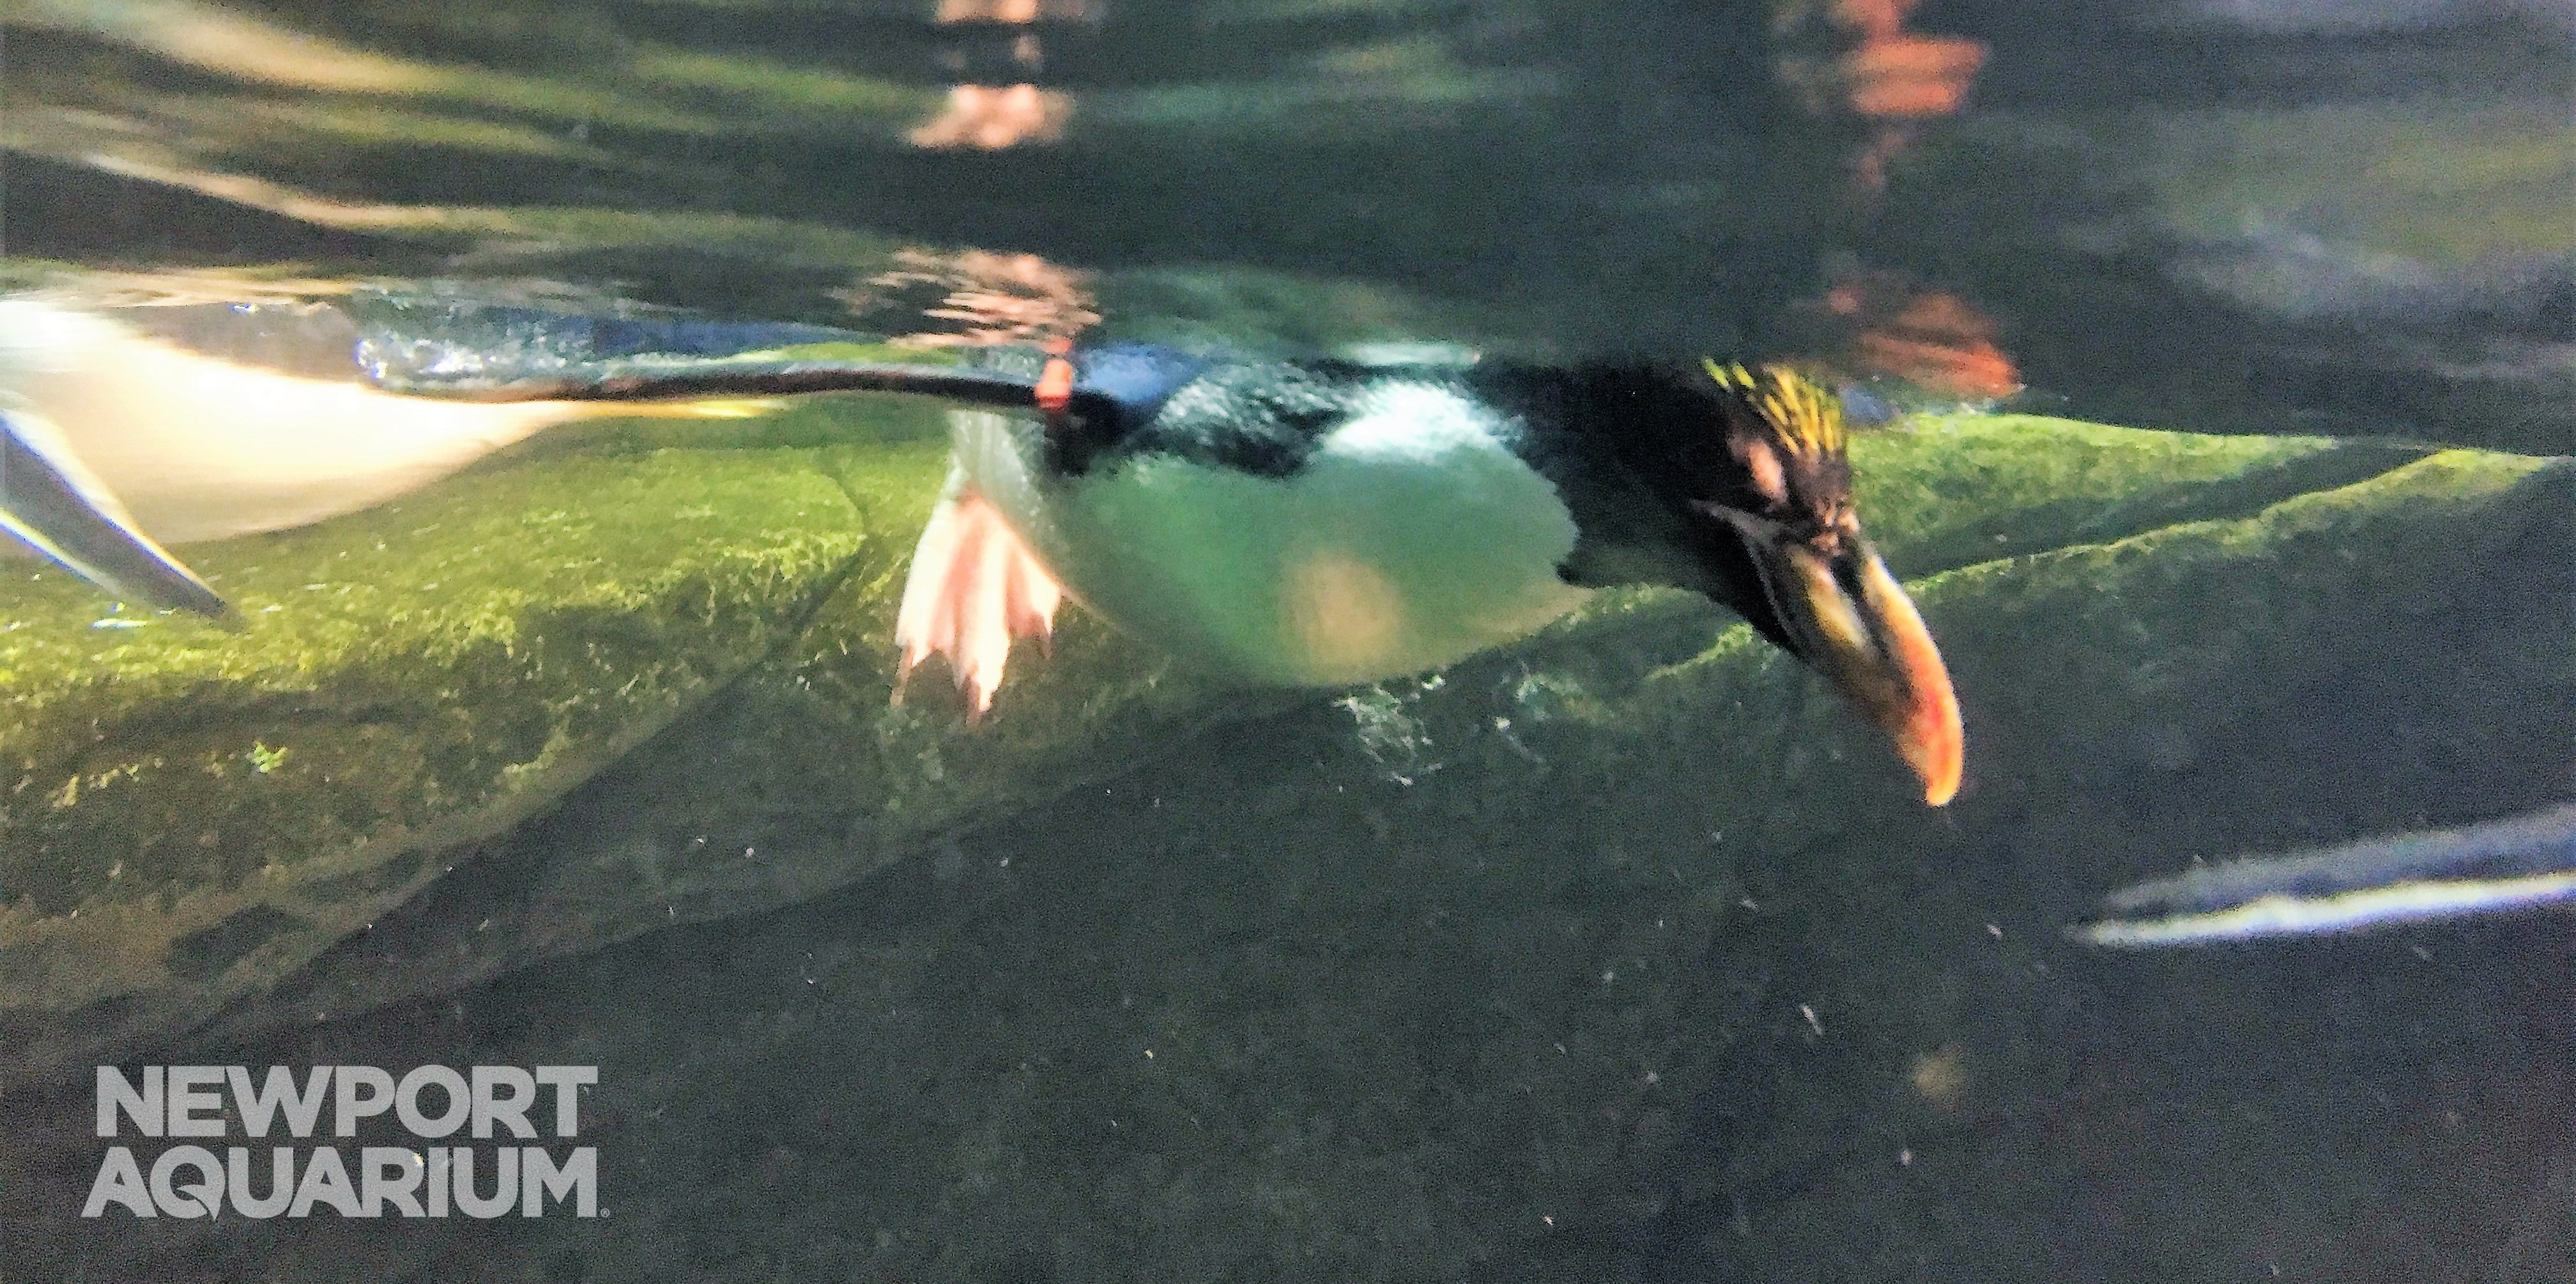 newport aquarium animal caretakers rally behind paralyzed penguin